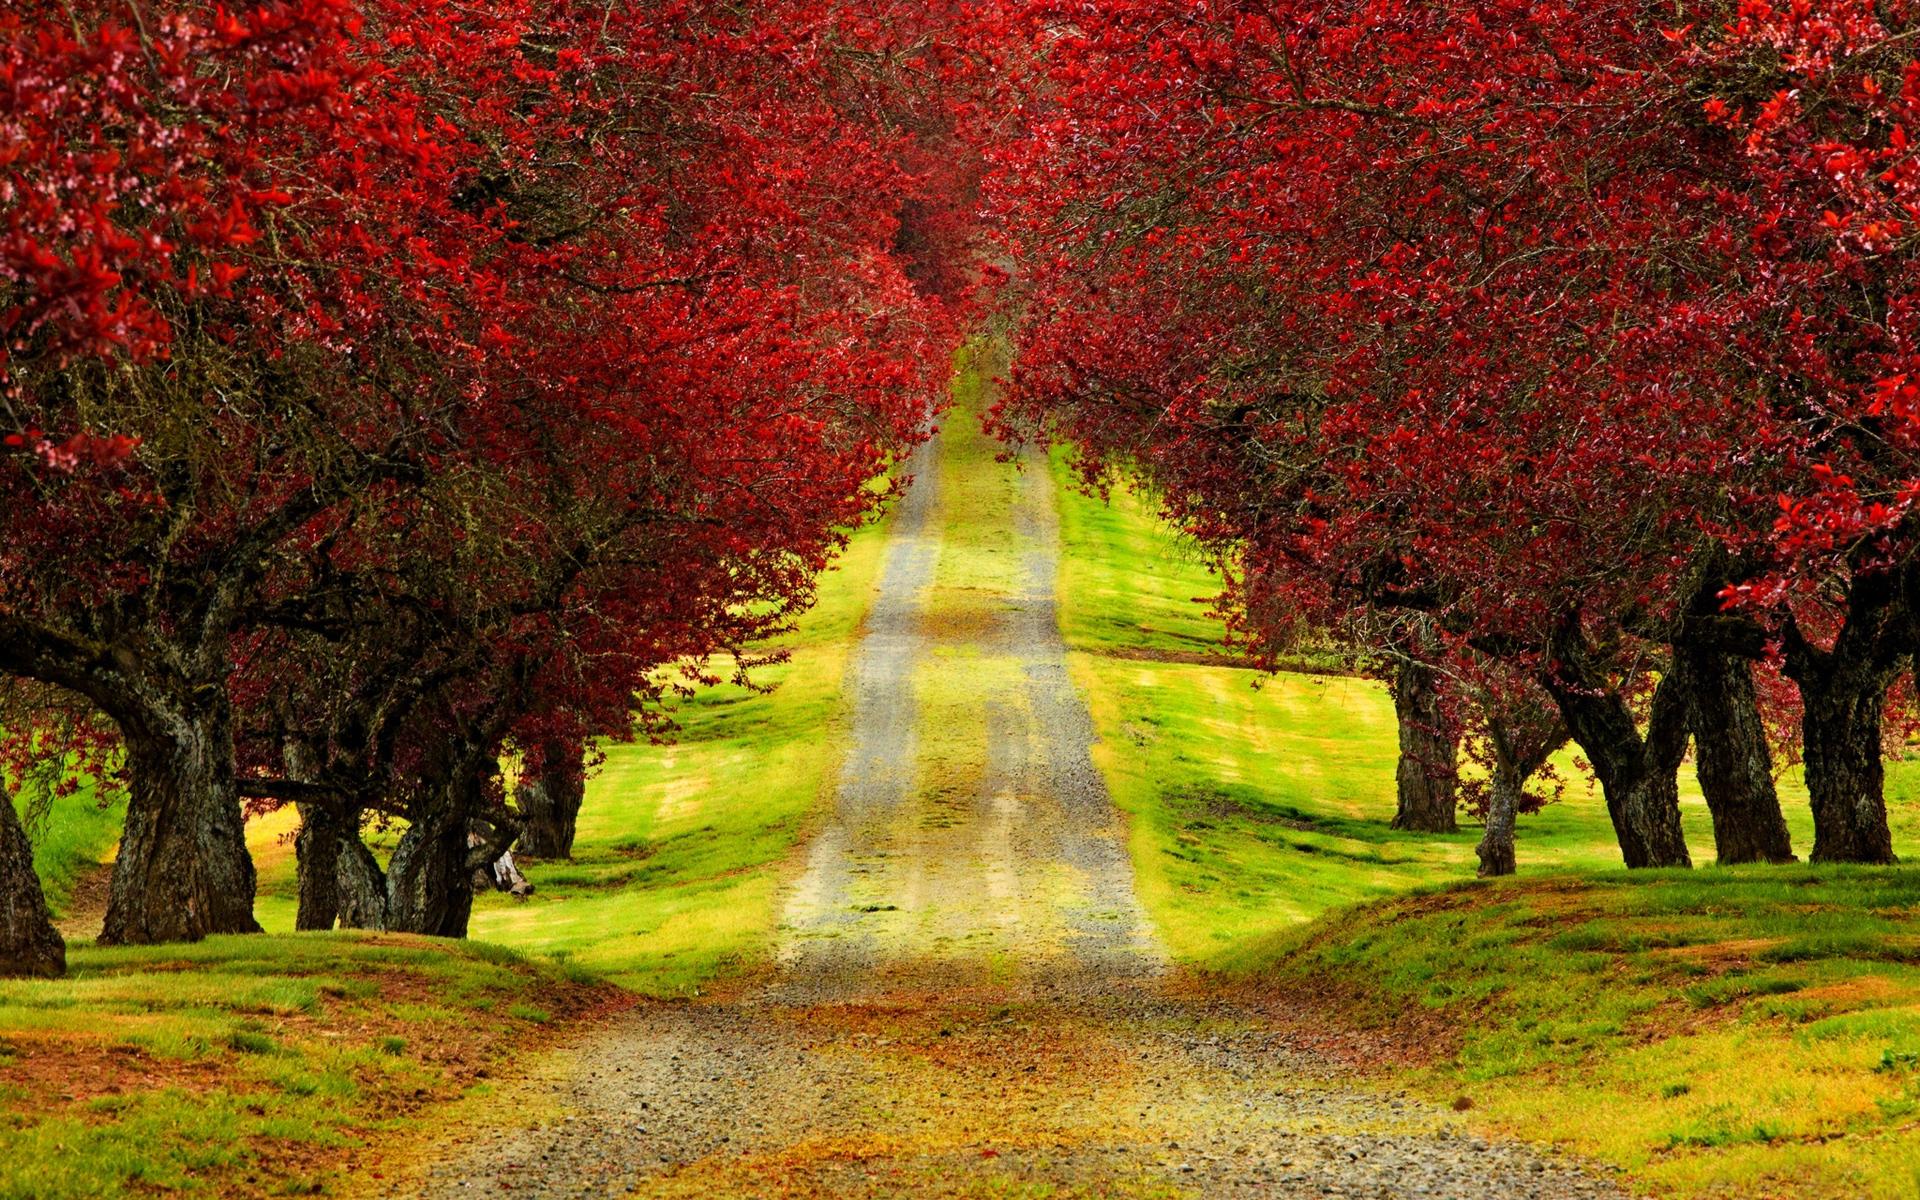 71 Fall Trees Wallpaper On Wallpapersafari Wallpaper autumn road rays alley trees